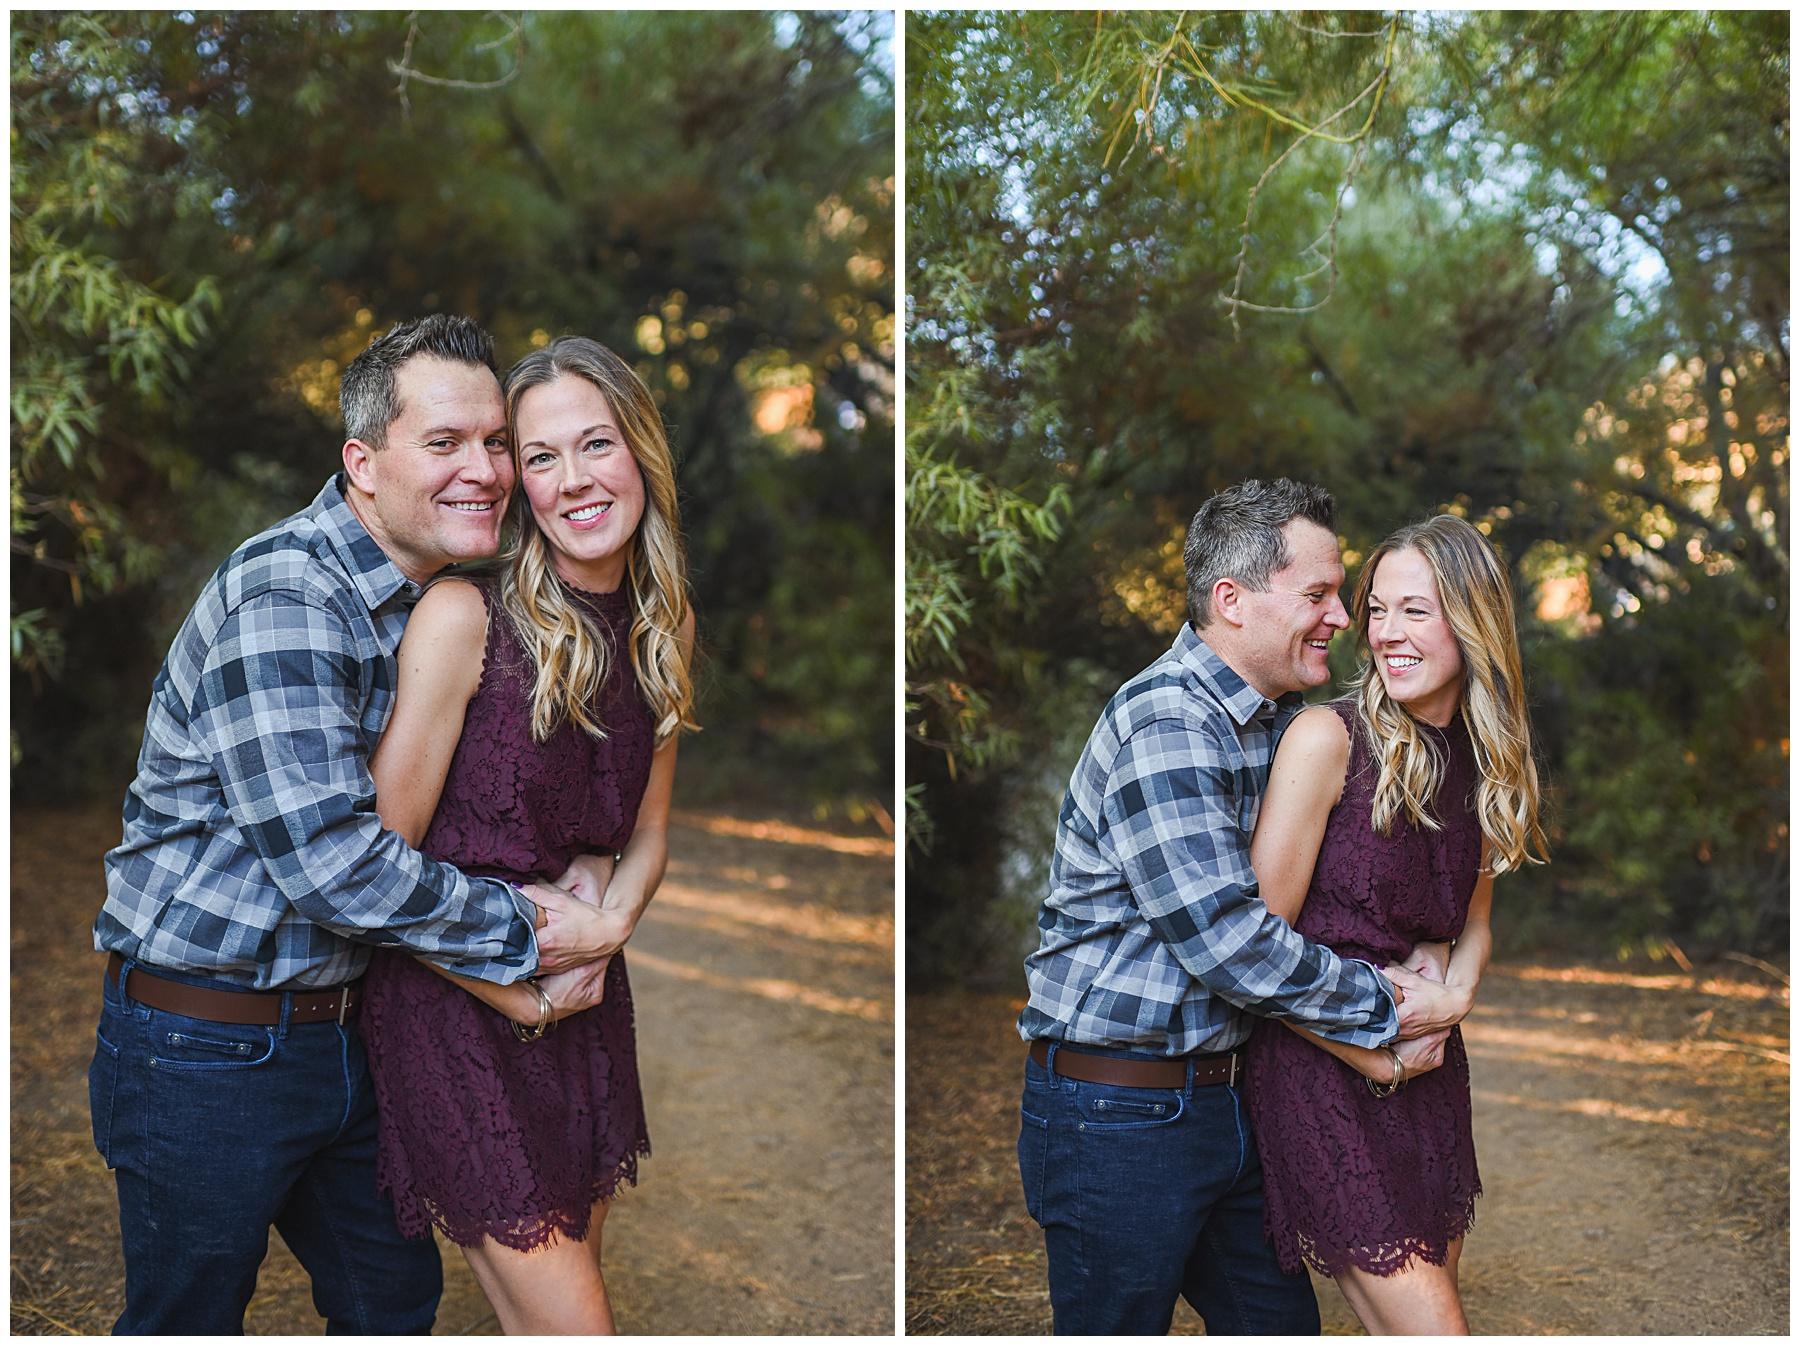 Mom + Dad   Phoenix Lifestyle Family Portraits